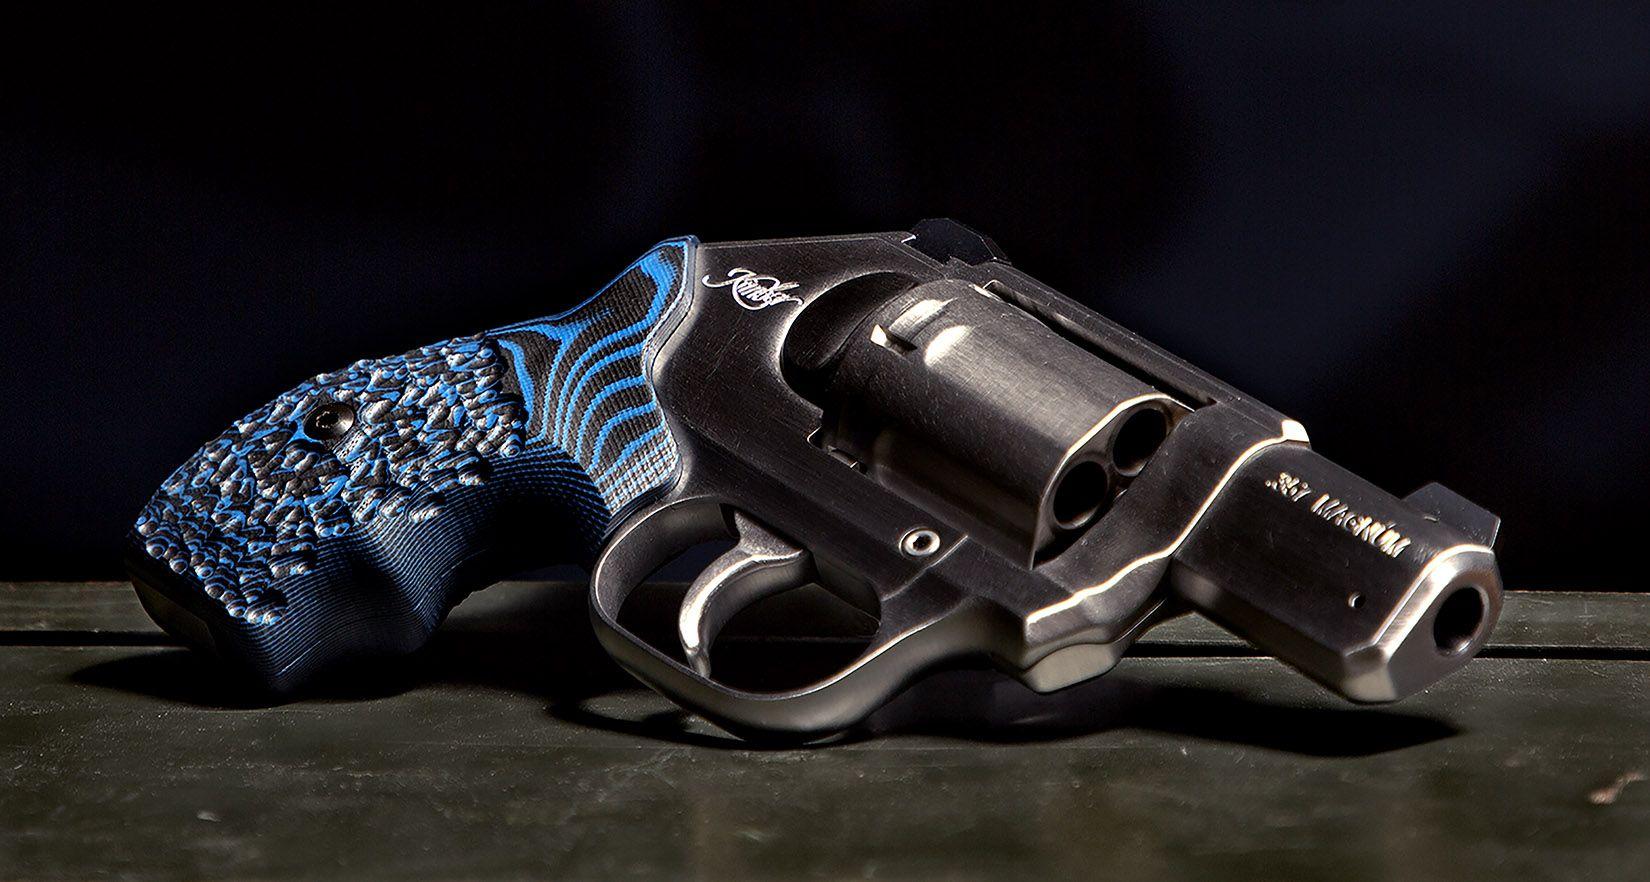 VZ Grips Blue black stipple grip on a Kimber K6 Cyclone